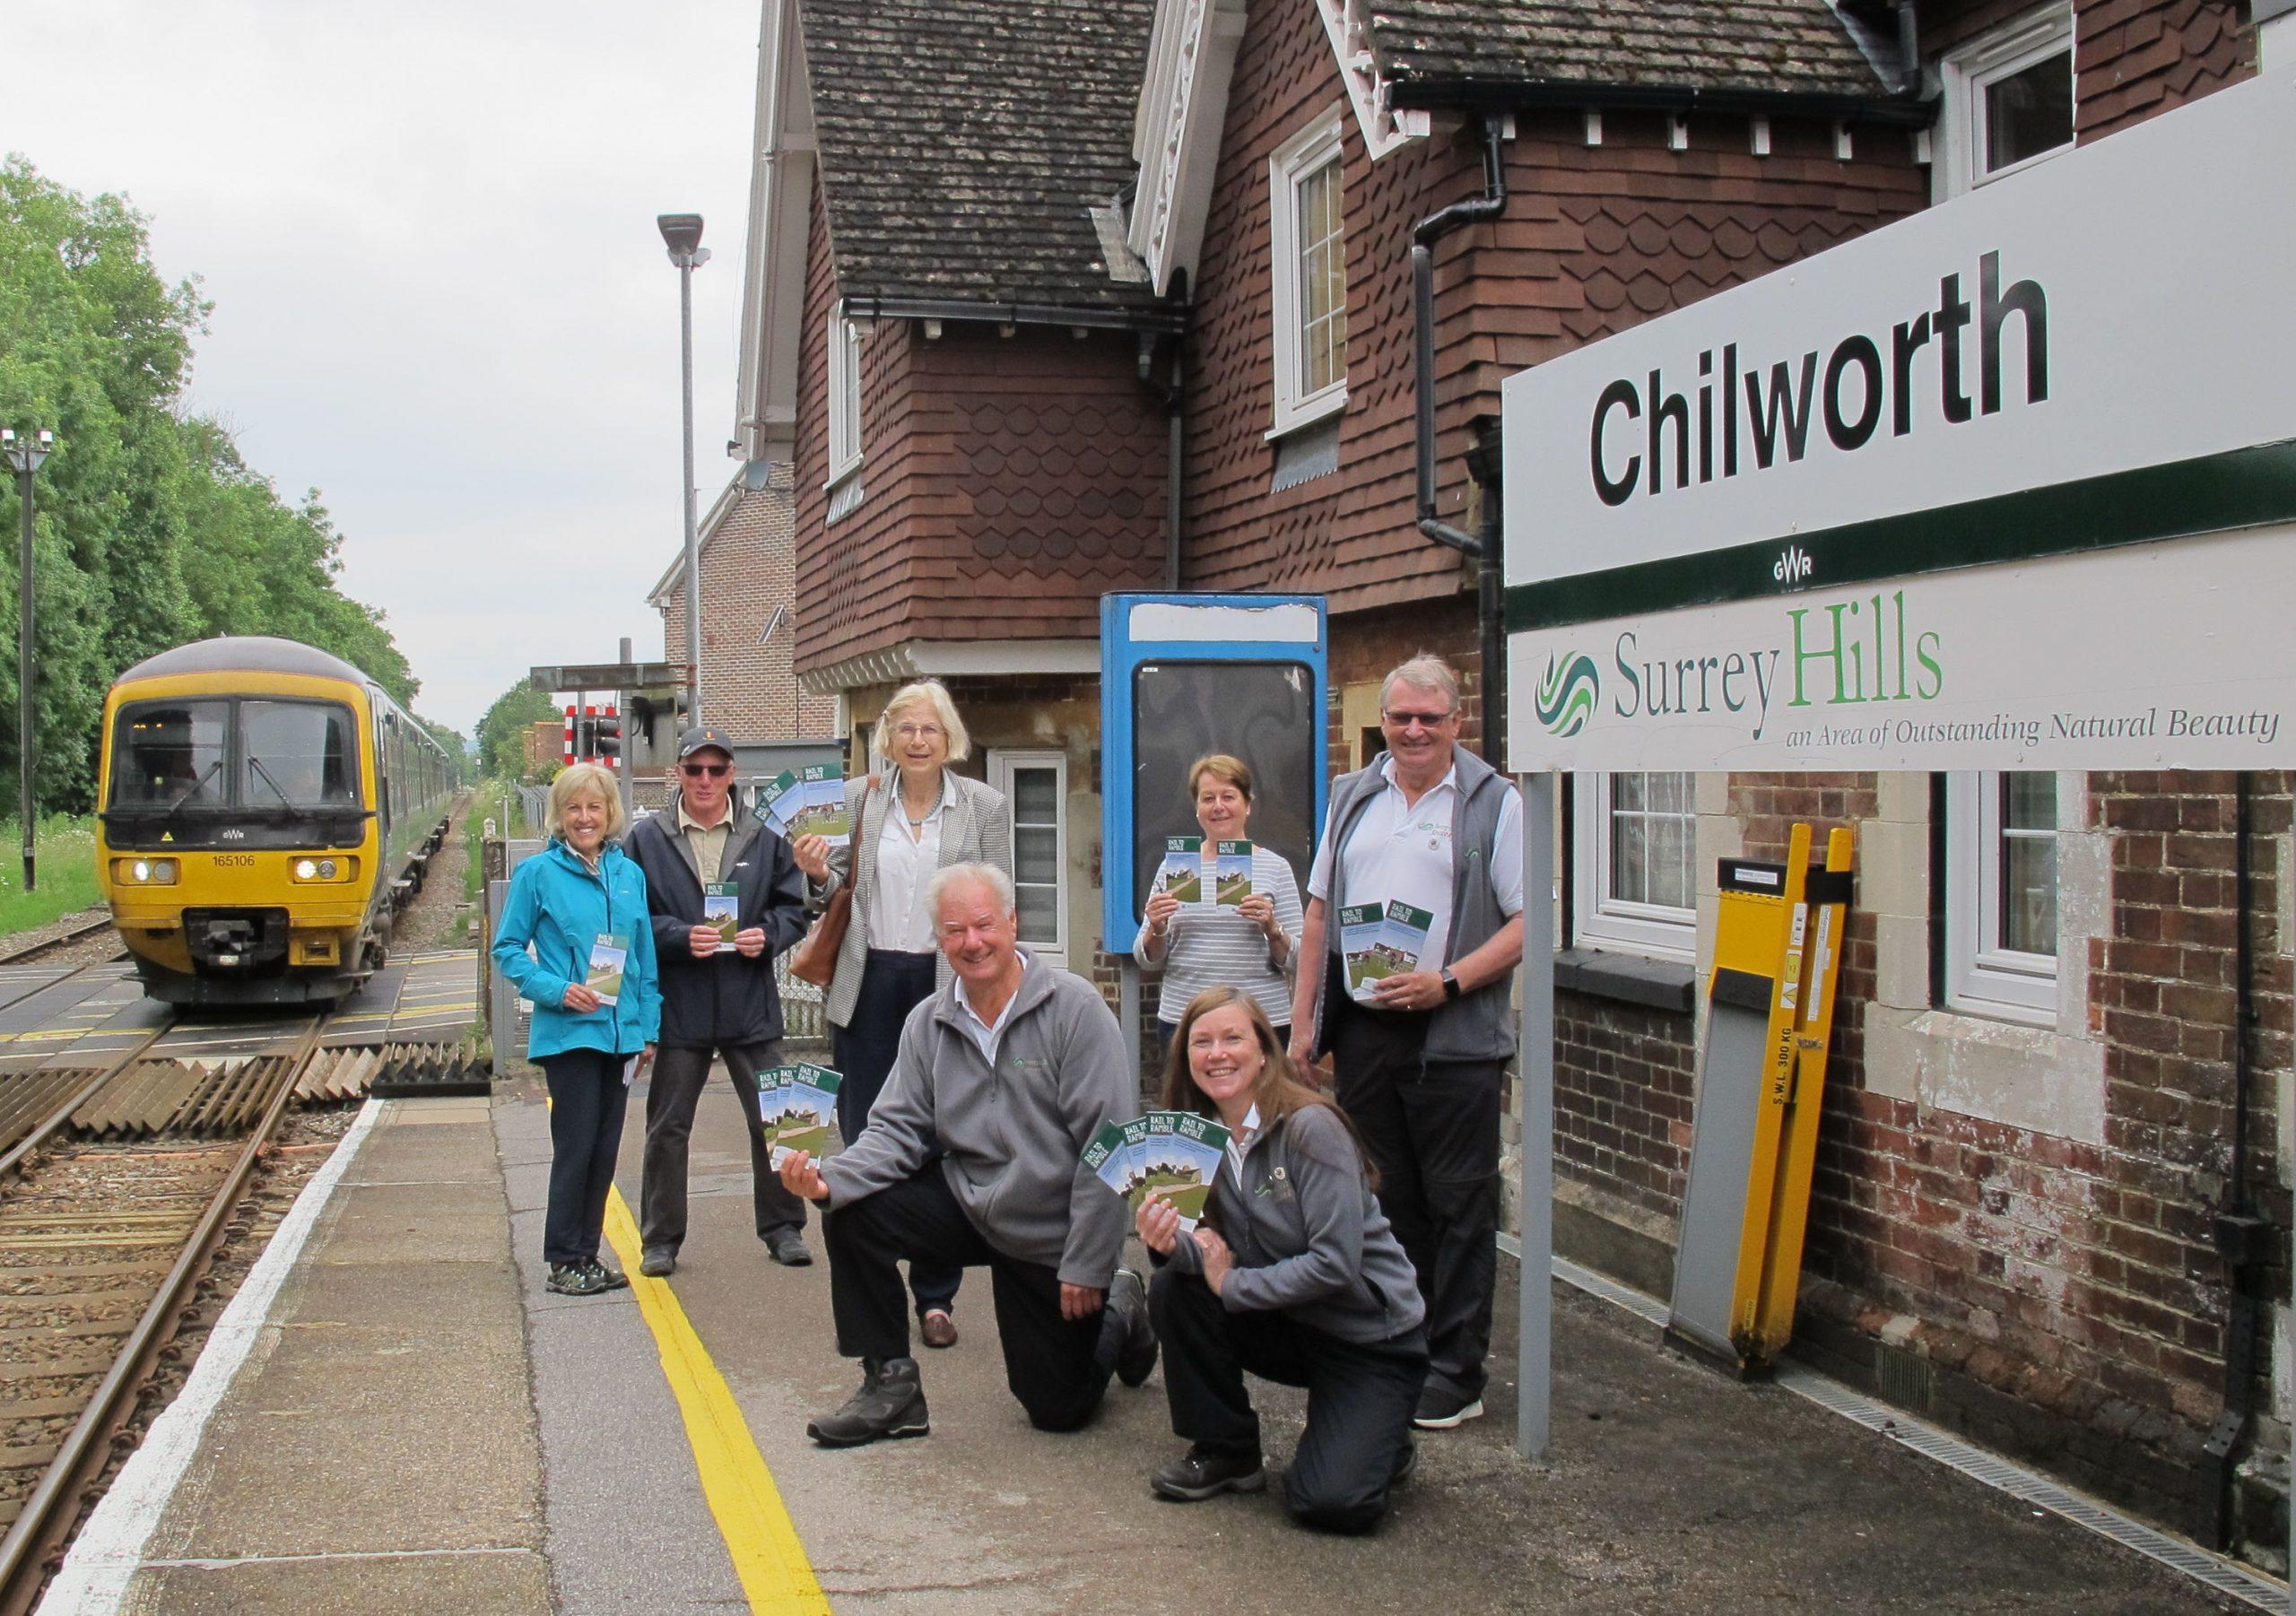 Rail to Ramble launch in Surrey Hills